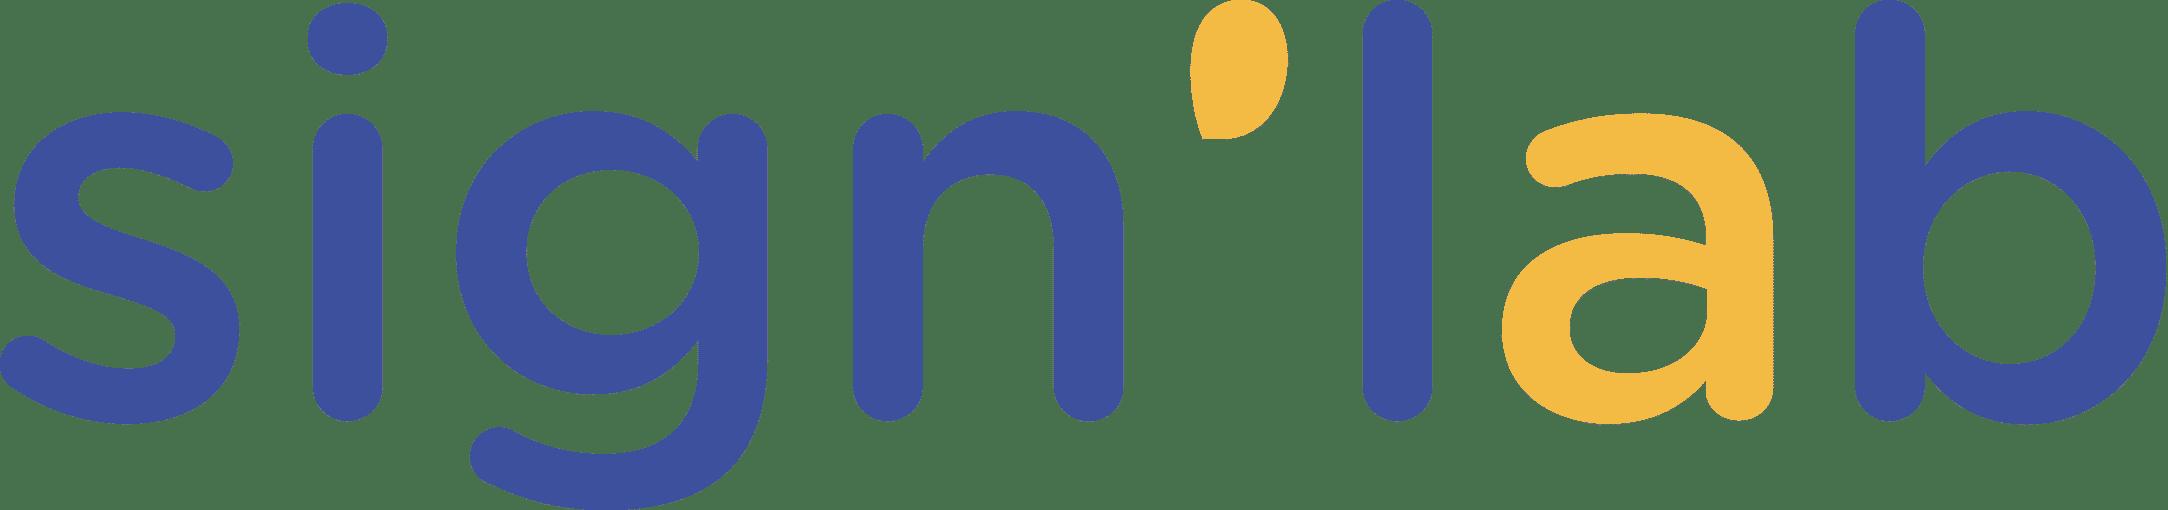 Plateforme collaborative d'innovation - Semios